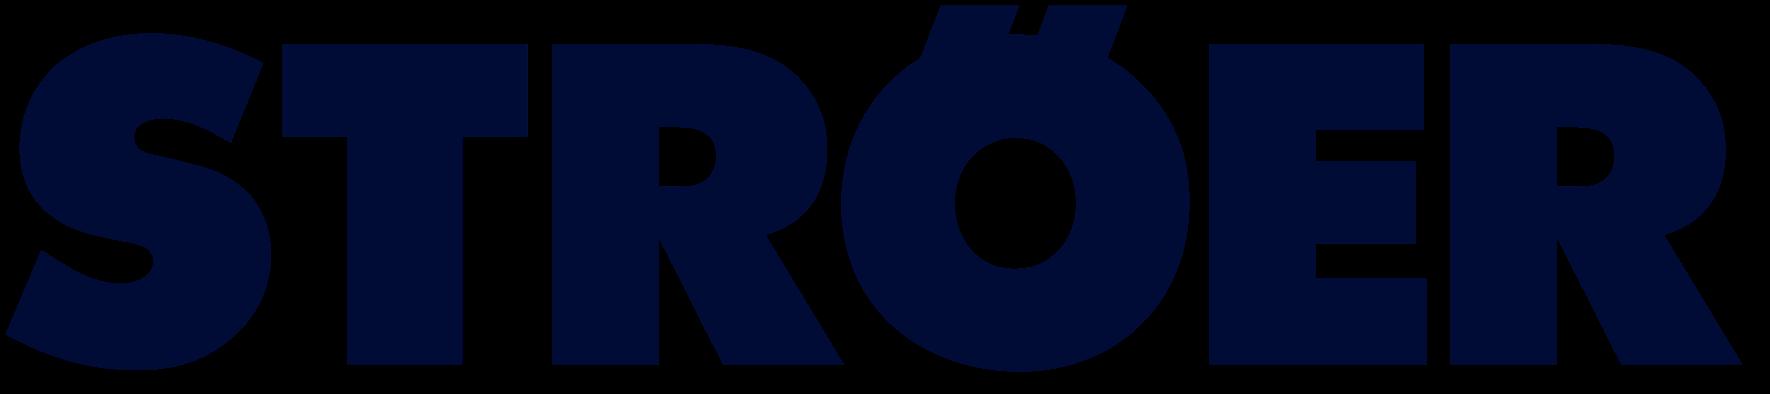 Ströer